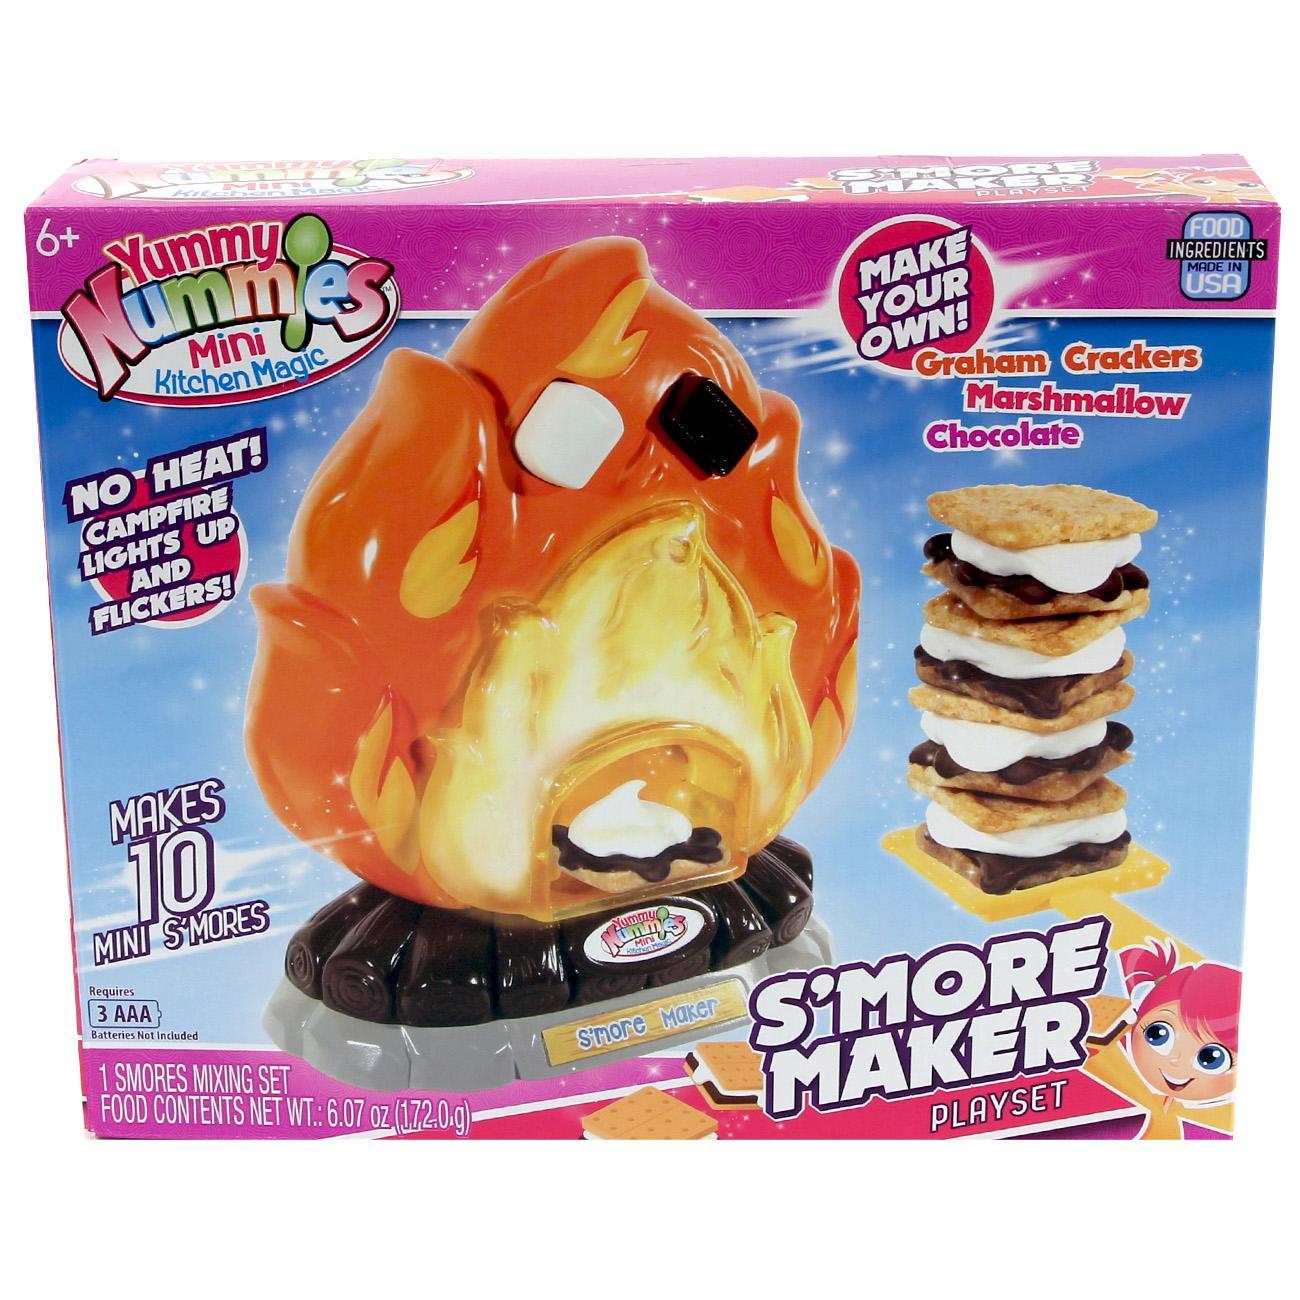 Amazon.com: Yummy Nummy Mini Kitchen Playset S'Mores Maker